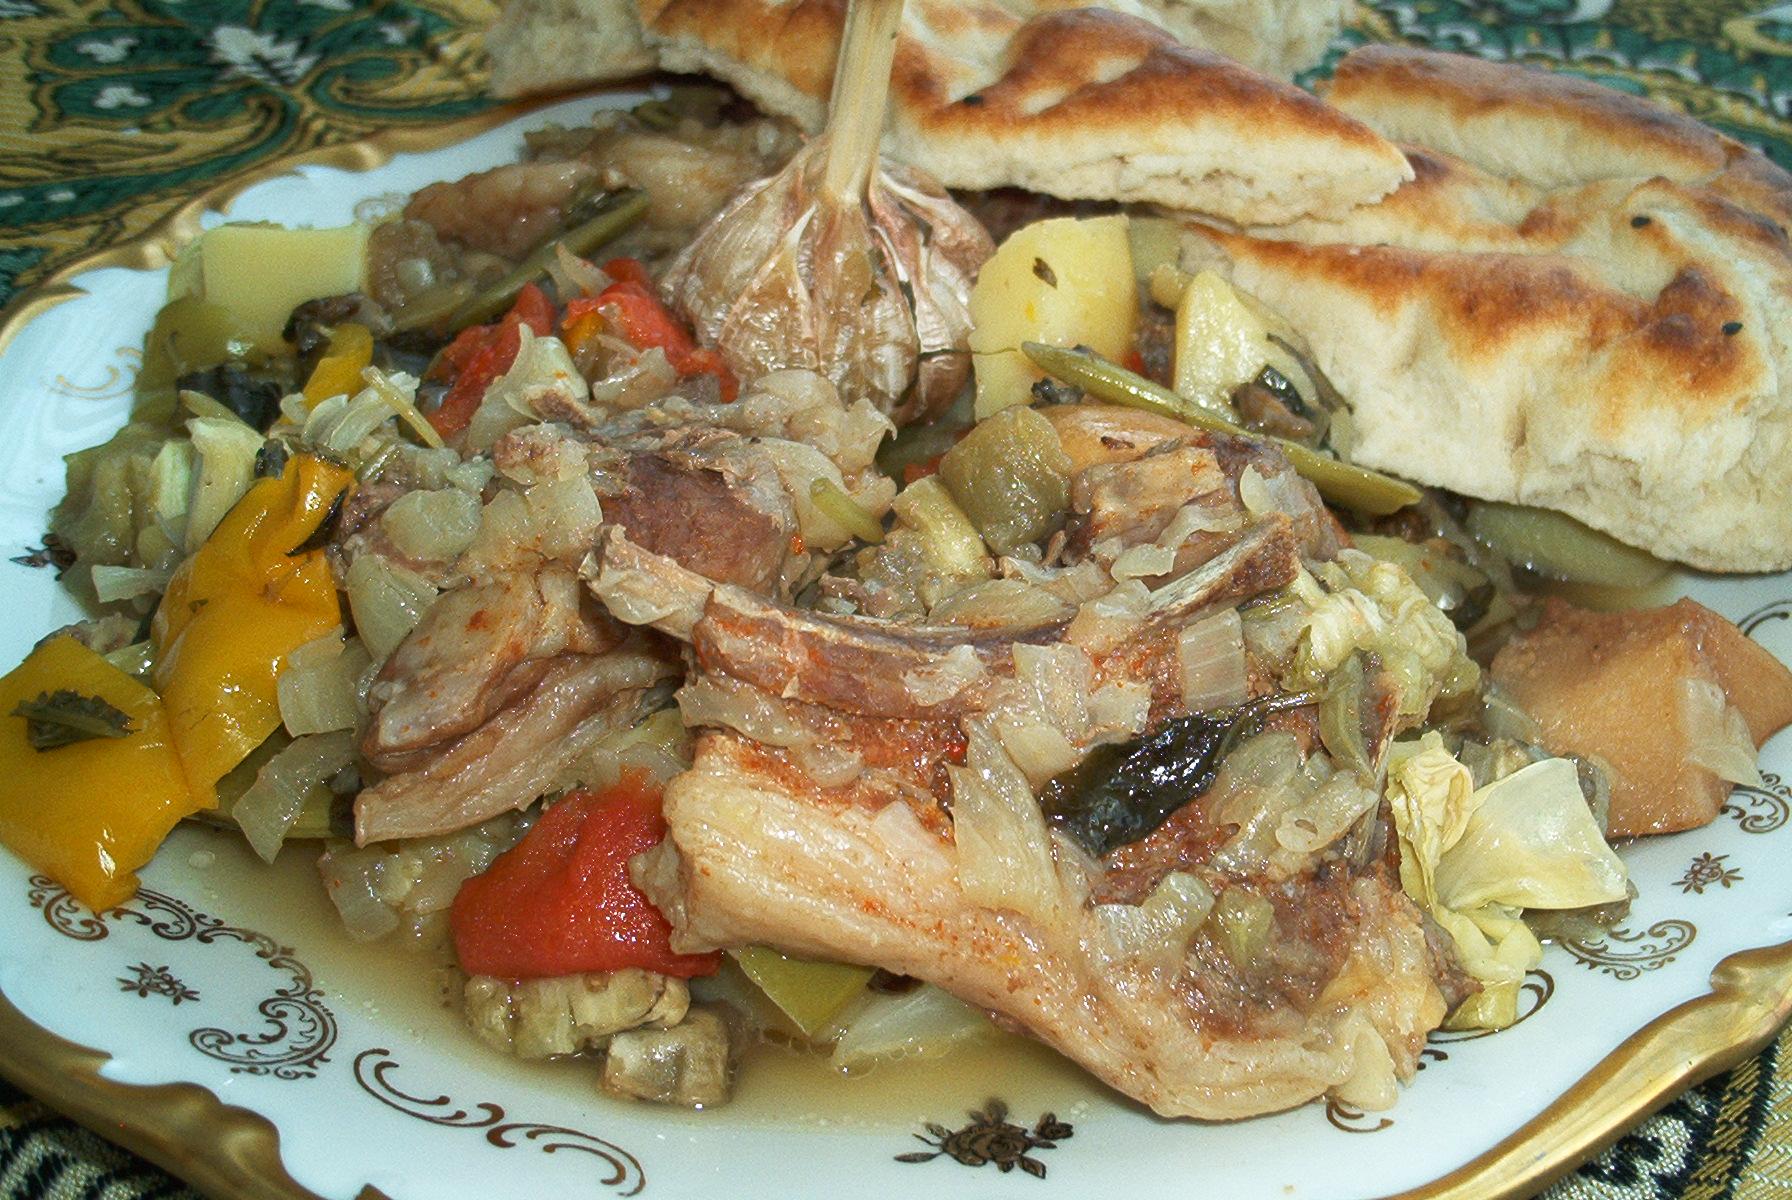 Буглама з баранини азербайджанською, грузинський рецепт